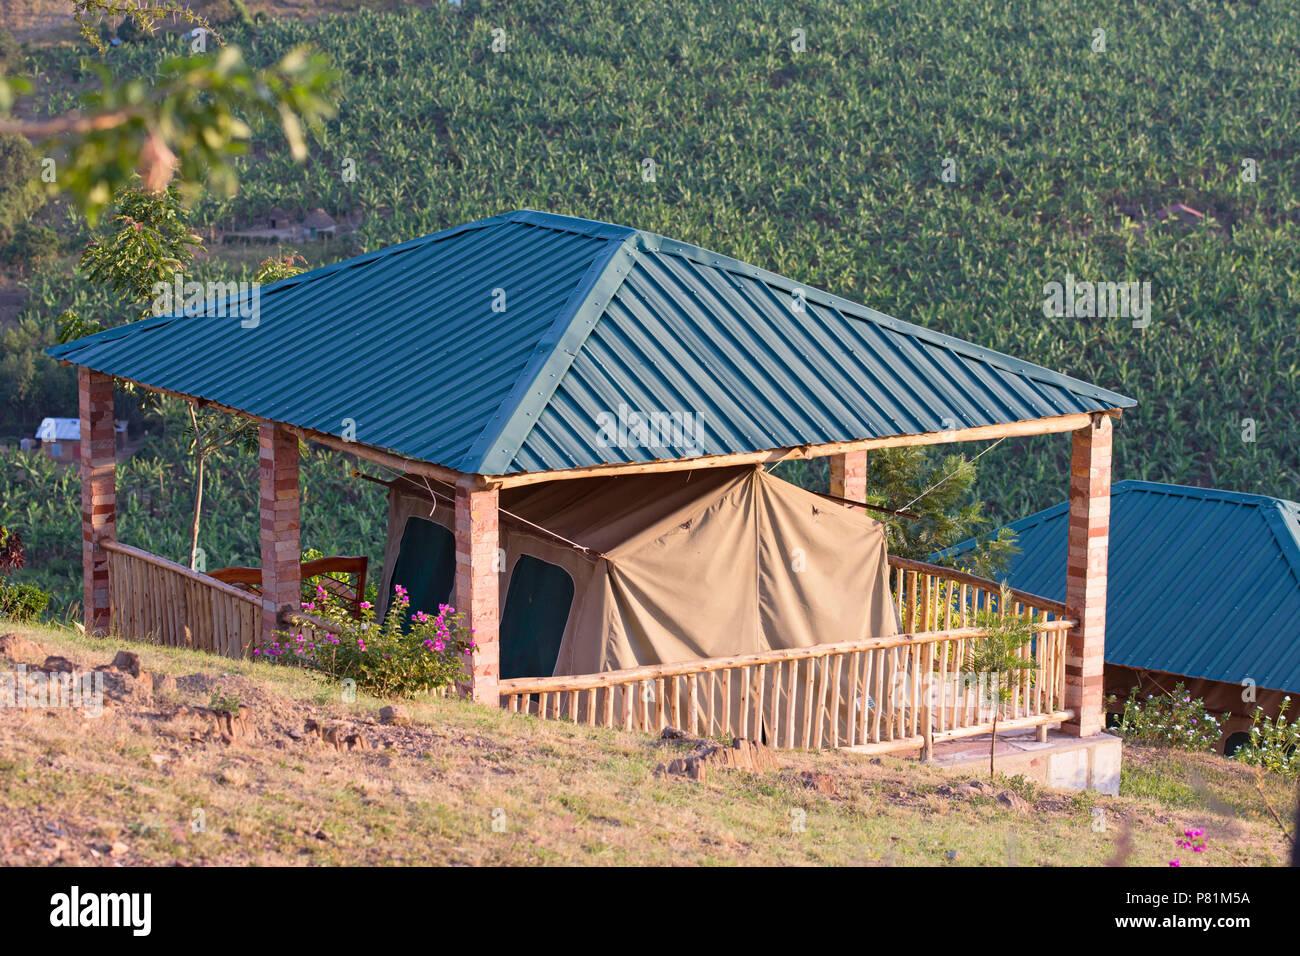 Nido dell'Aquila, Tented Camp al Lago Mburo, Safari Lodge, Resort, Uganda, Africa orientale Immagini Stock